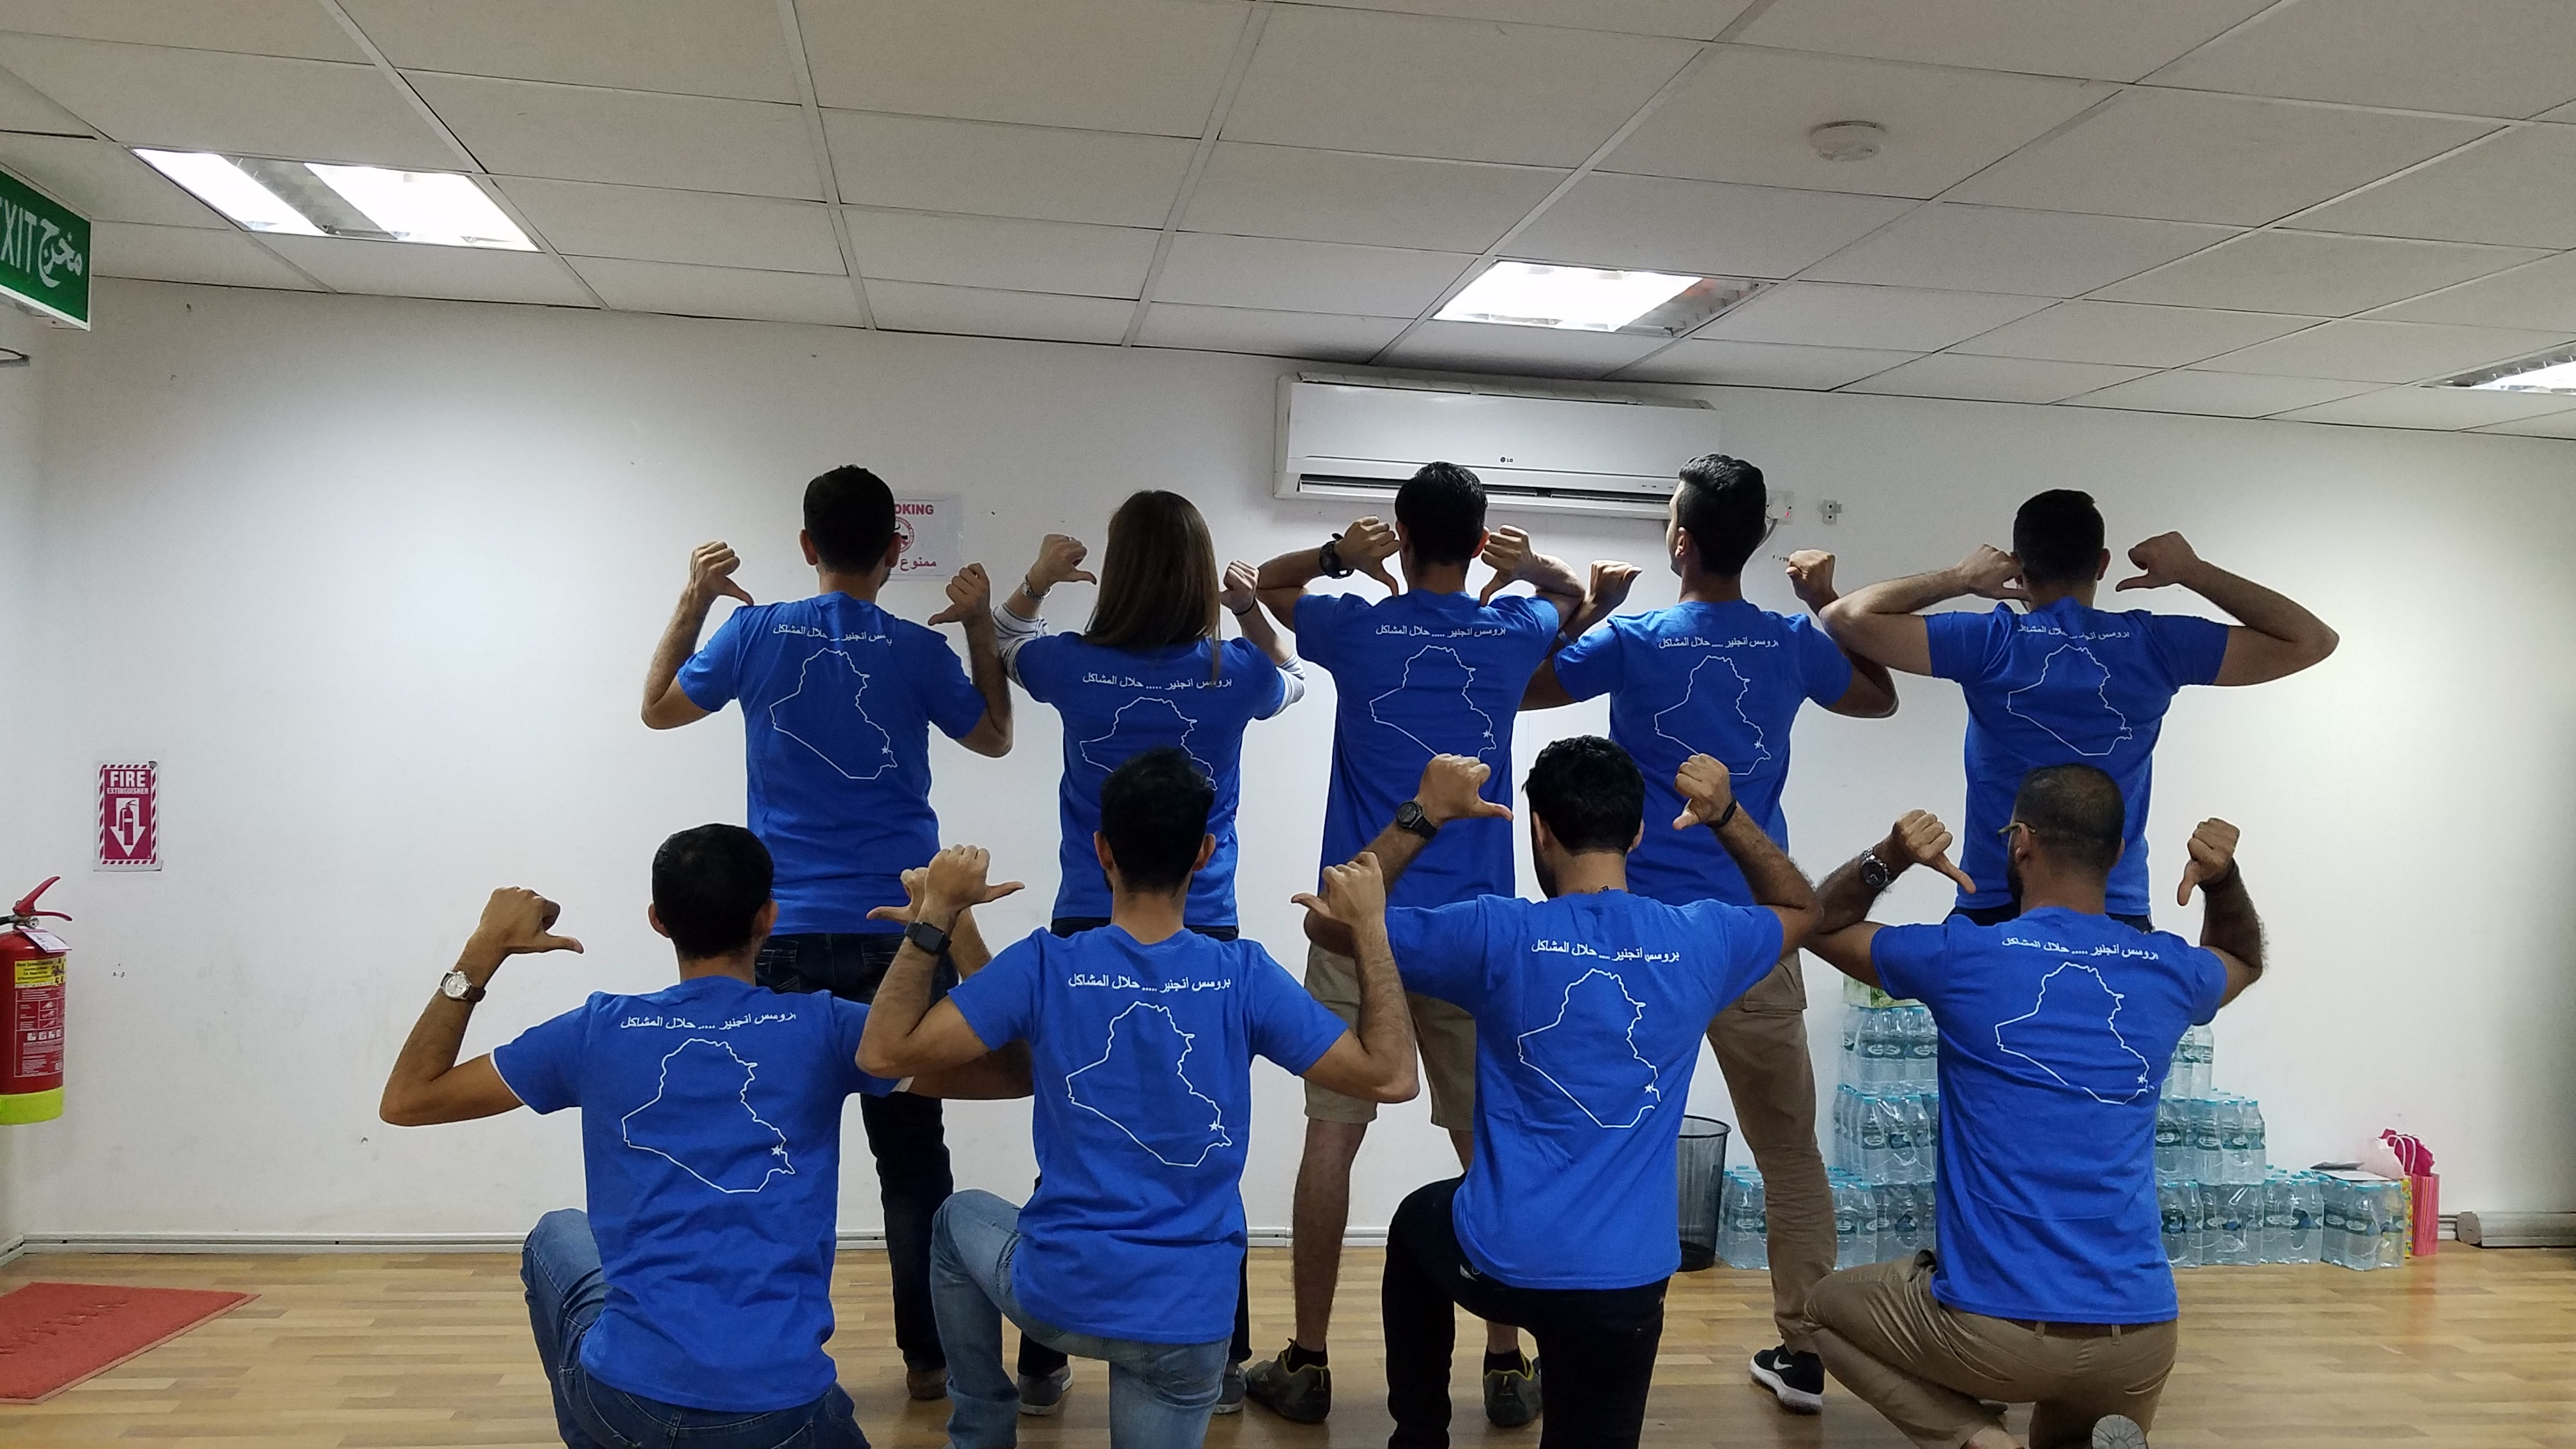 iraq engineering team t shirts t shirt photo